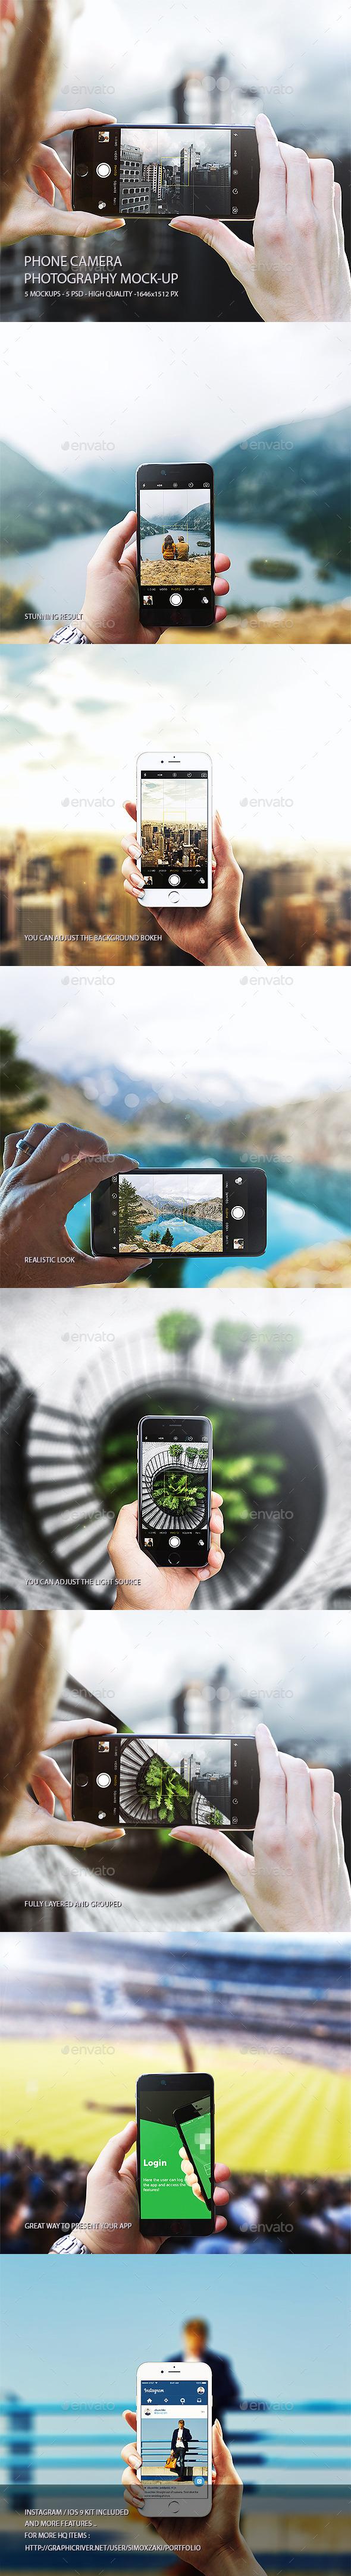 Phone camera photography mockup - Mobile Displays